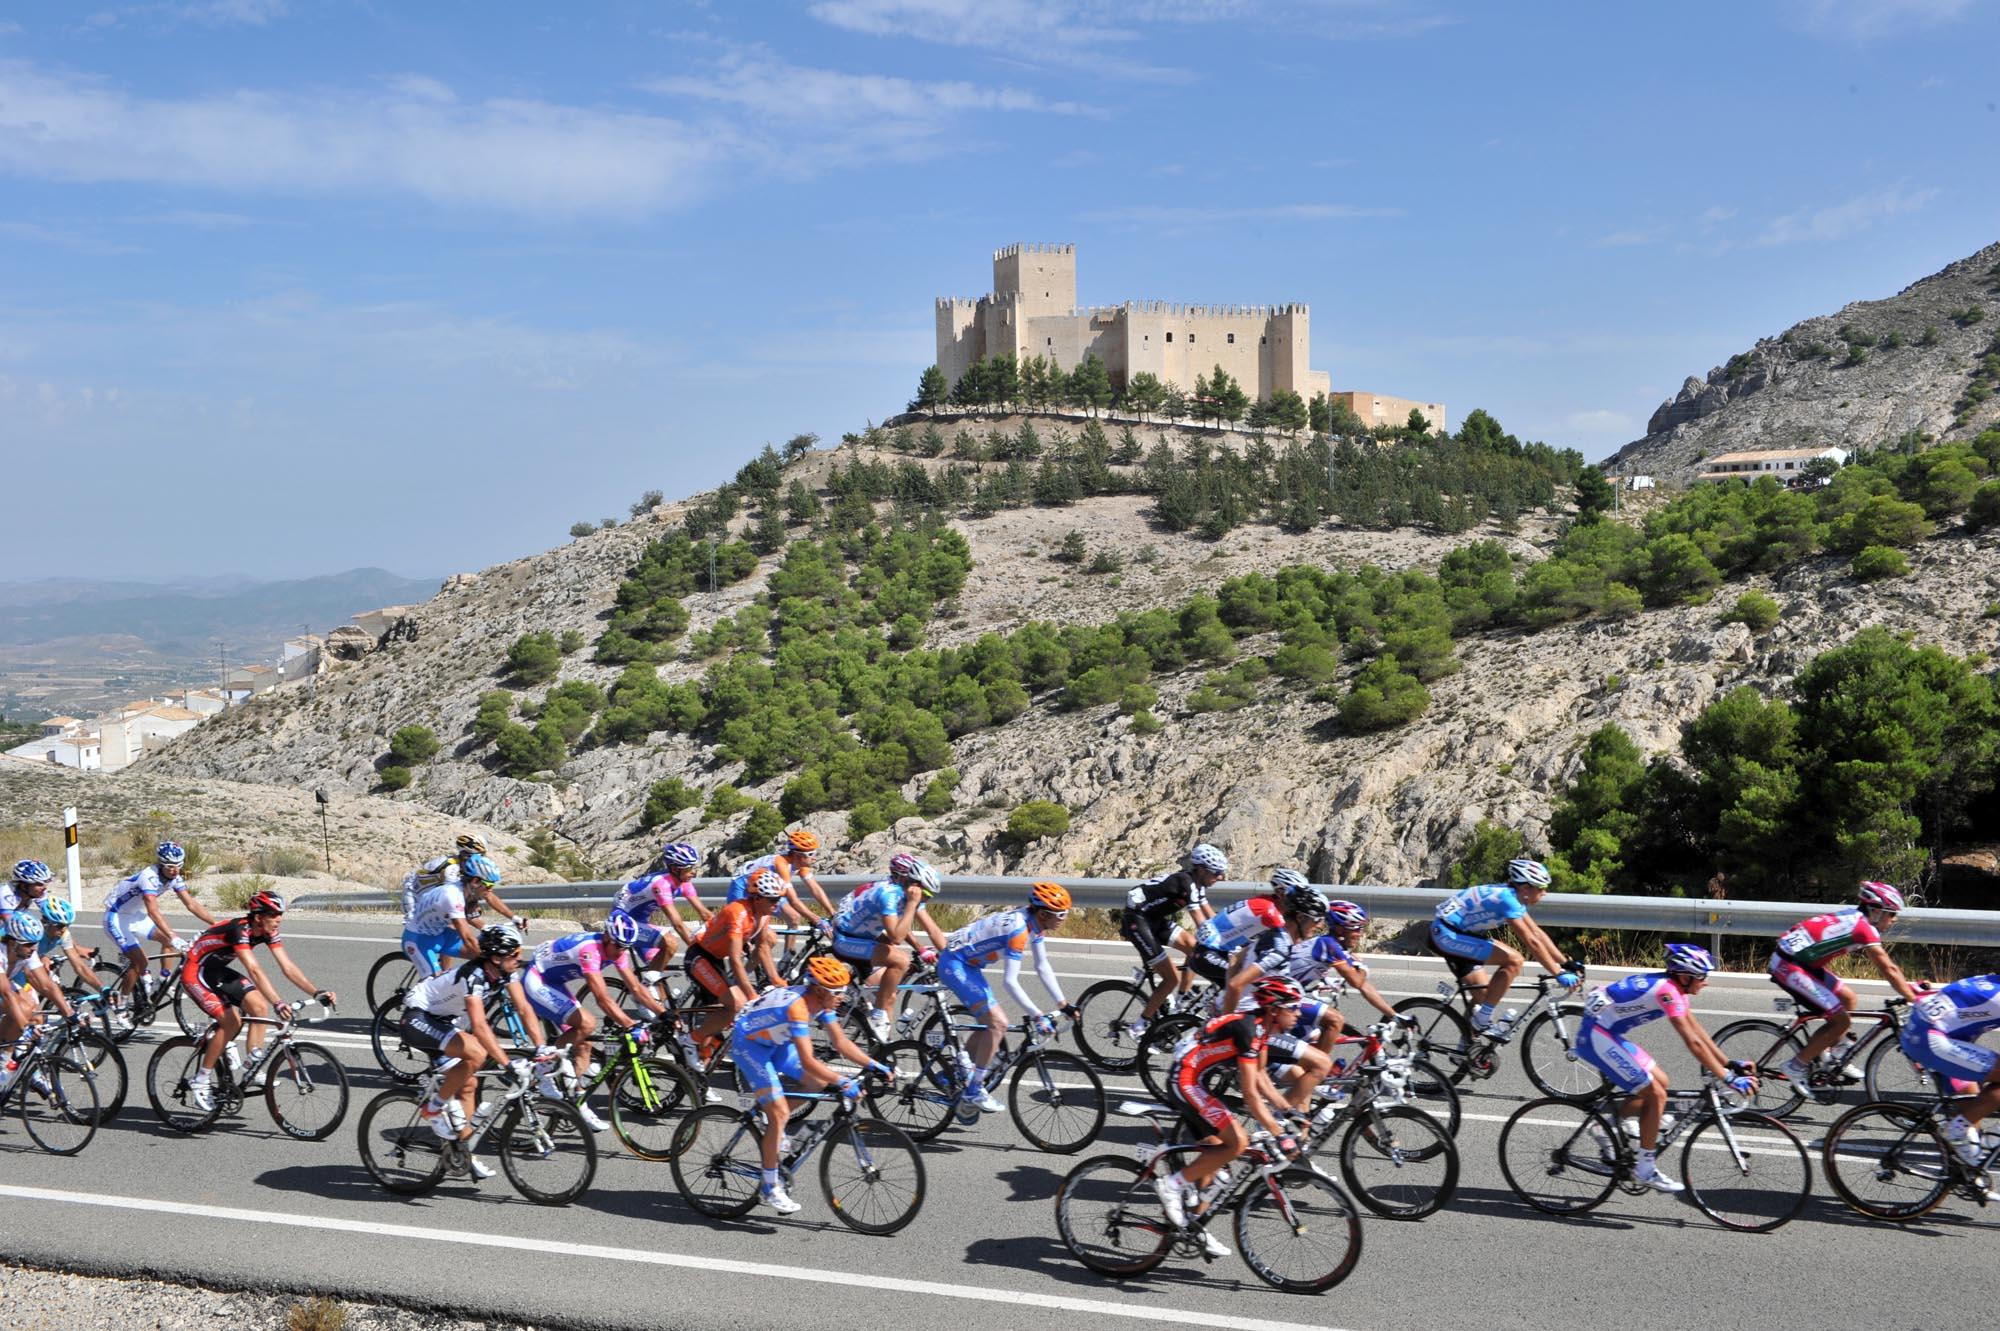 Vuelta a Espana 2010, stage five